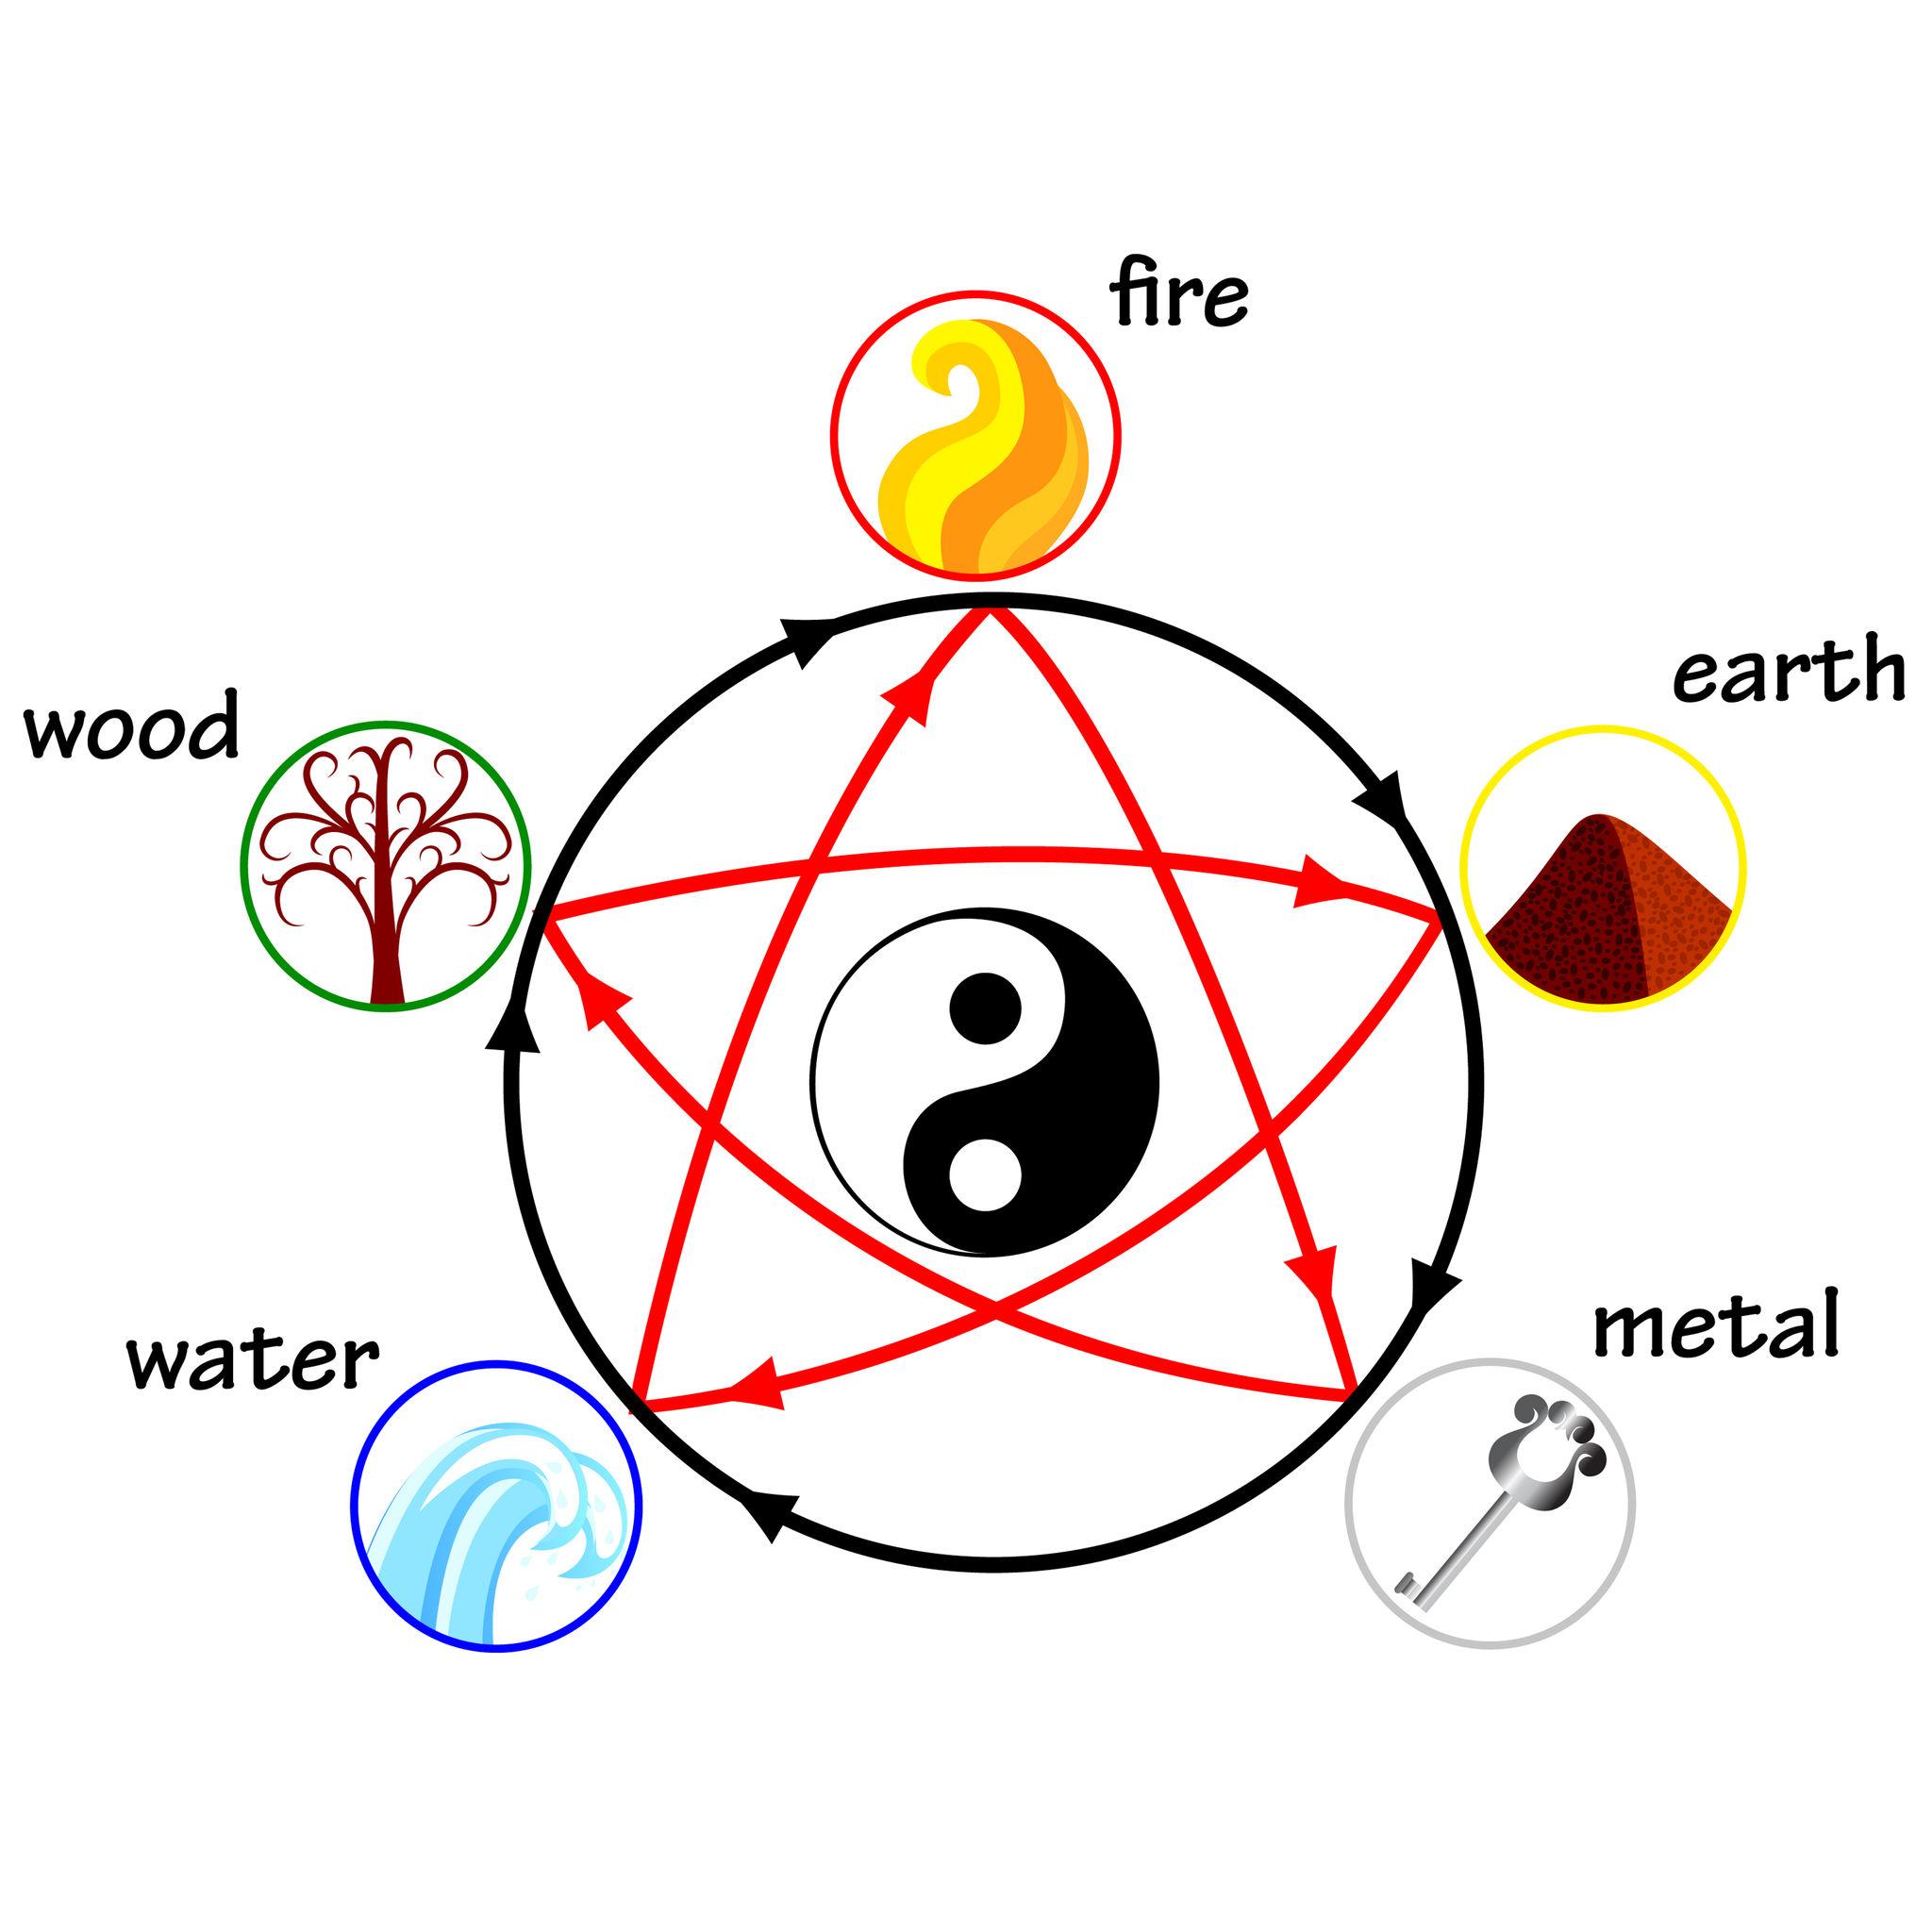 żywioły-pentagram.jpg